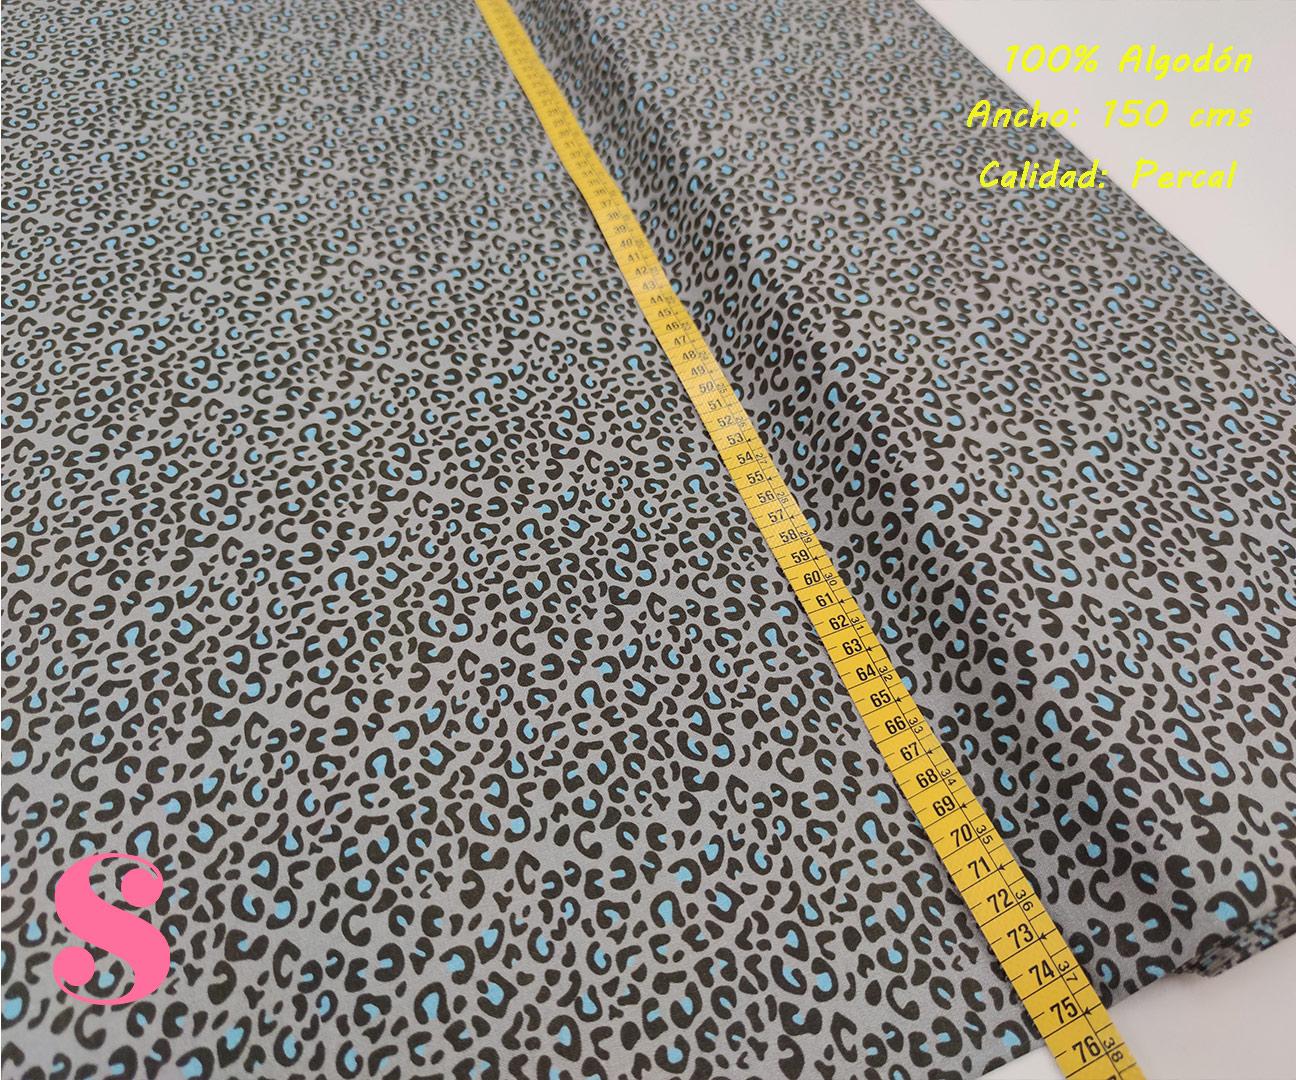 629-manchas-azul-fondo-gris-animal-print-leopardo-tejidos-algodón-estampado-percal,Tejido Estampado Animal Print Gris Mancha Azul,leopardo de colores